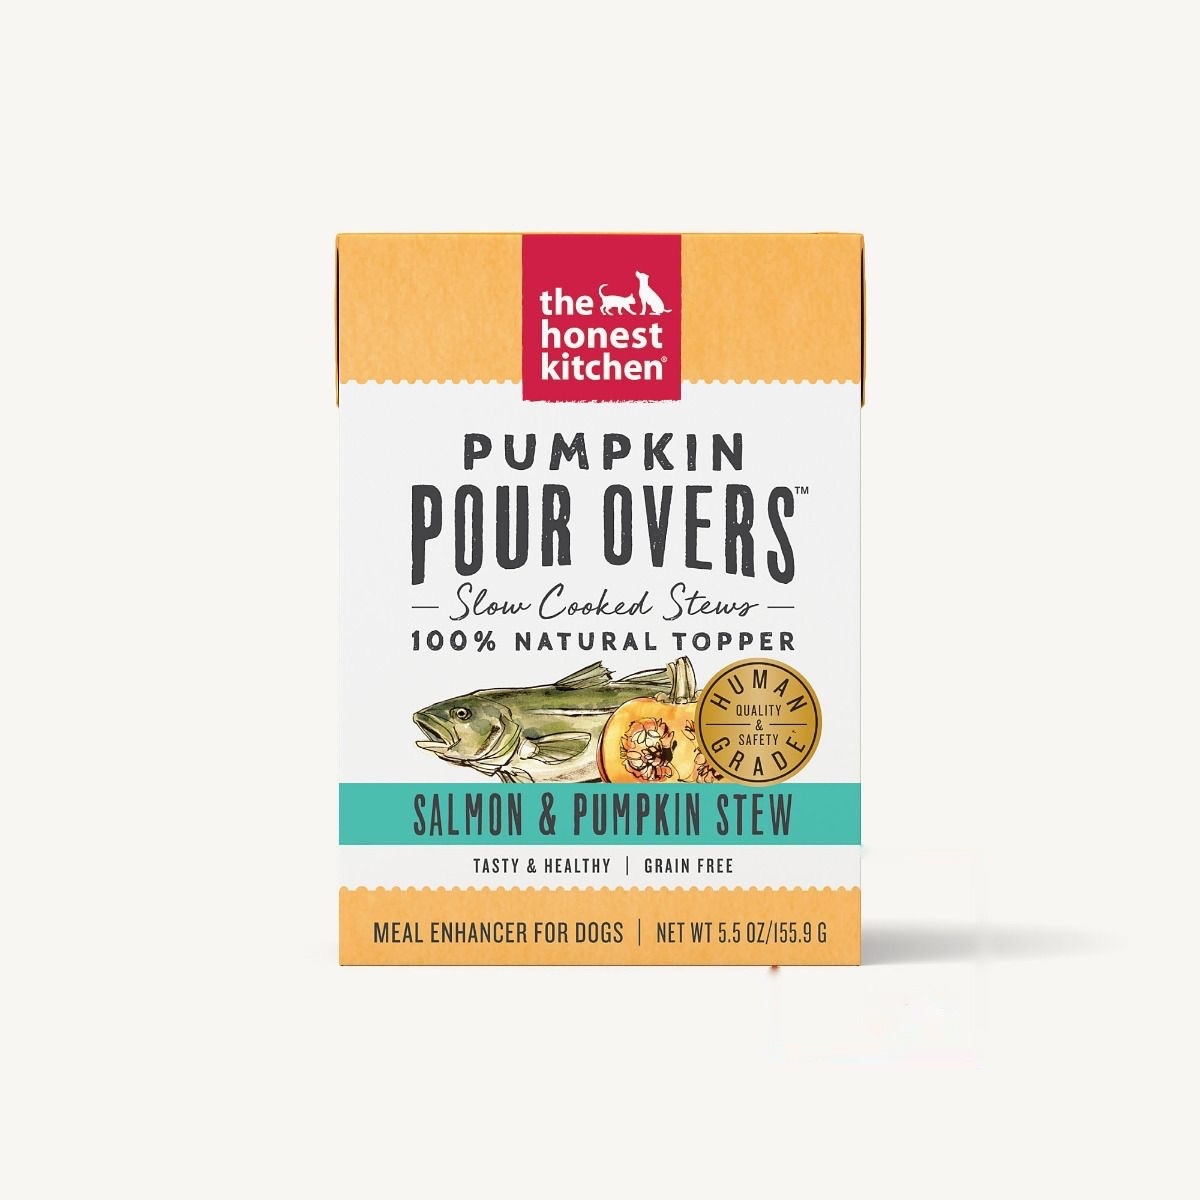 The Honest Kitchen Honest Kitchen Pumpkin Pour Overs Salmon & Pumpkin Stew 5.5oz Carton